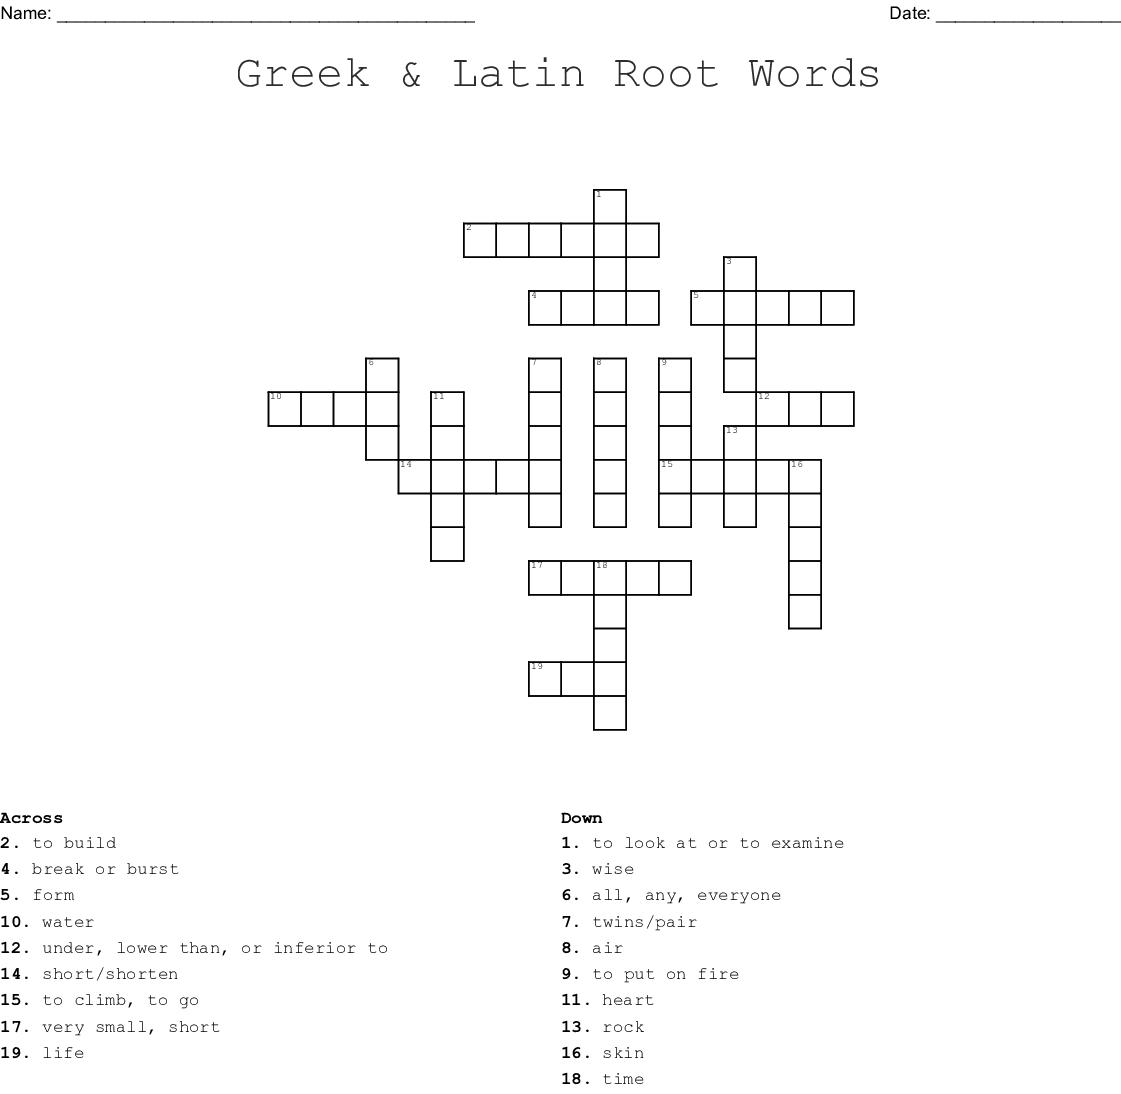 Greek Amp Latin Root Words Crossword